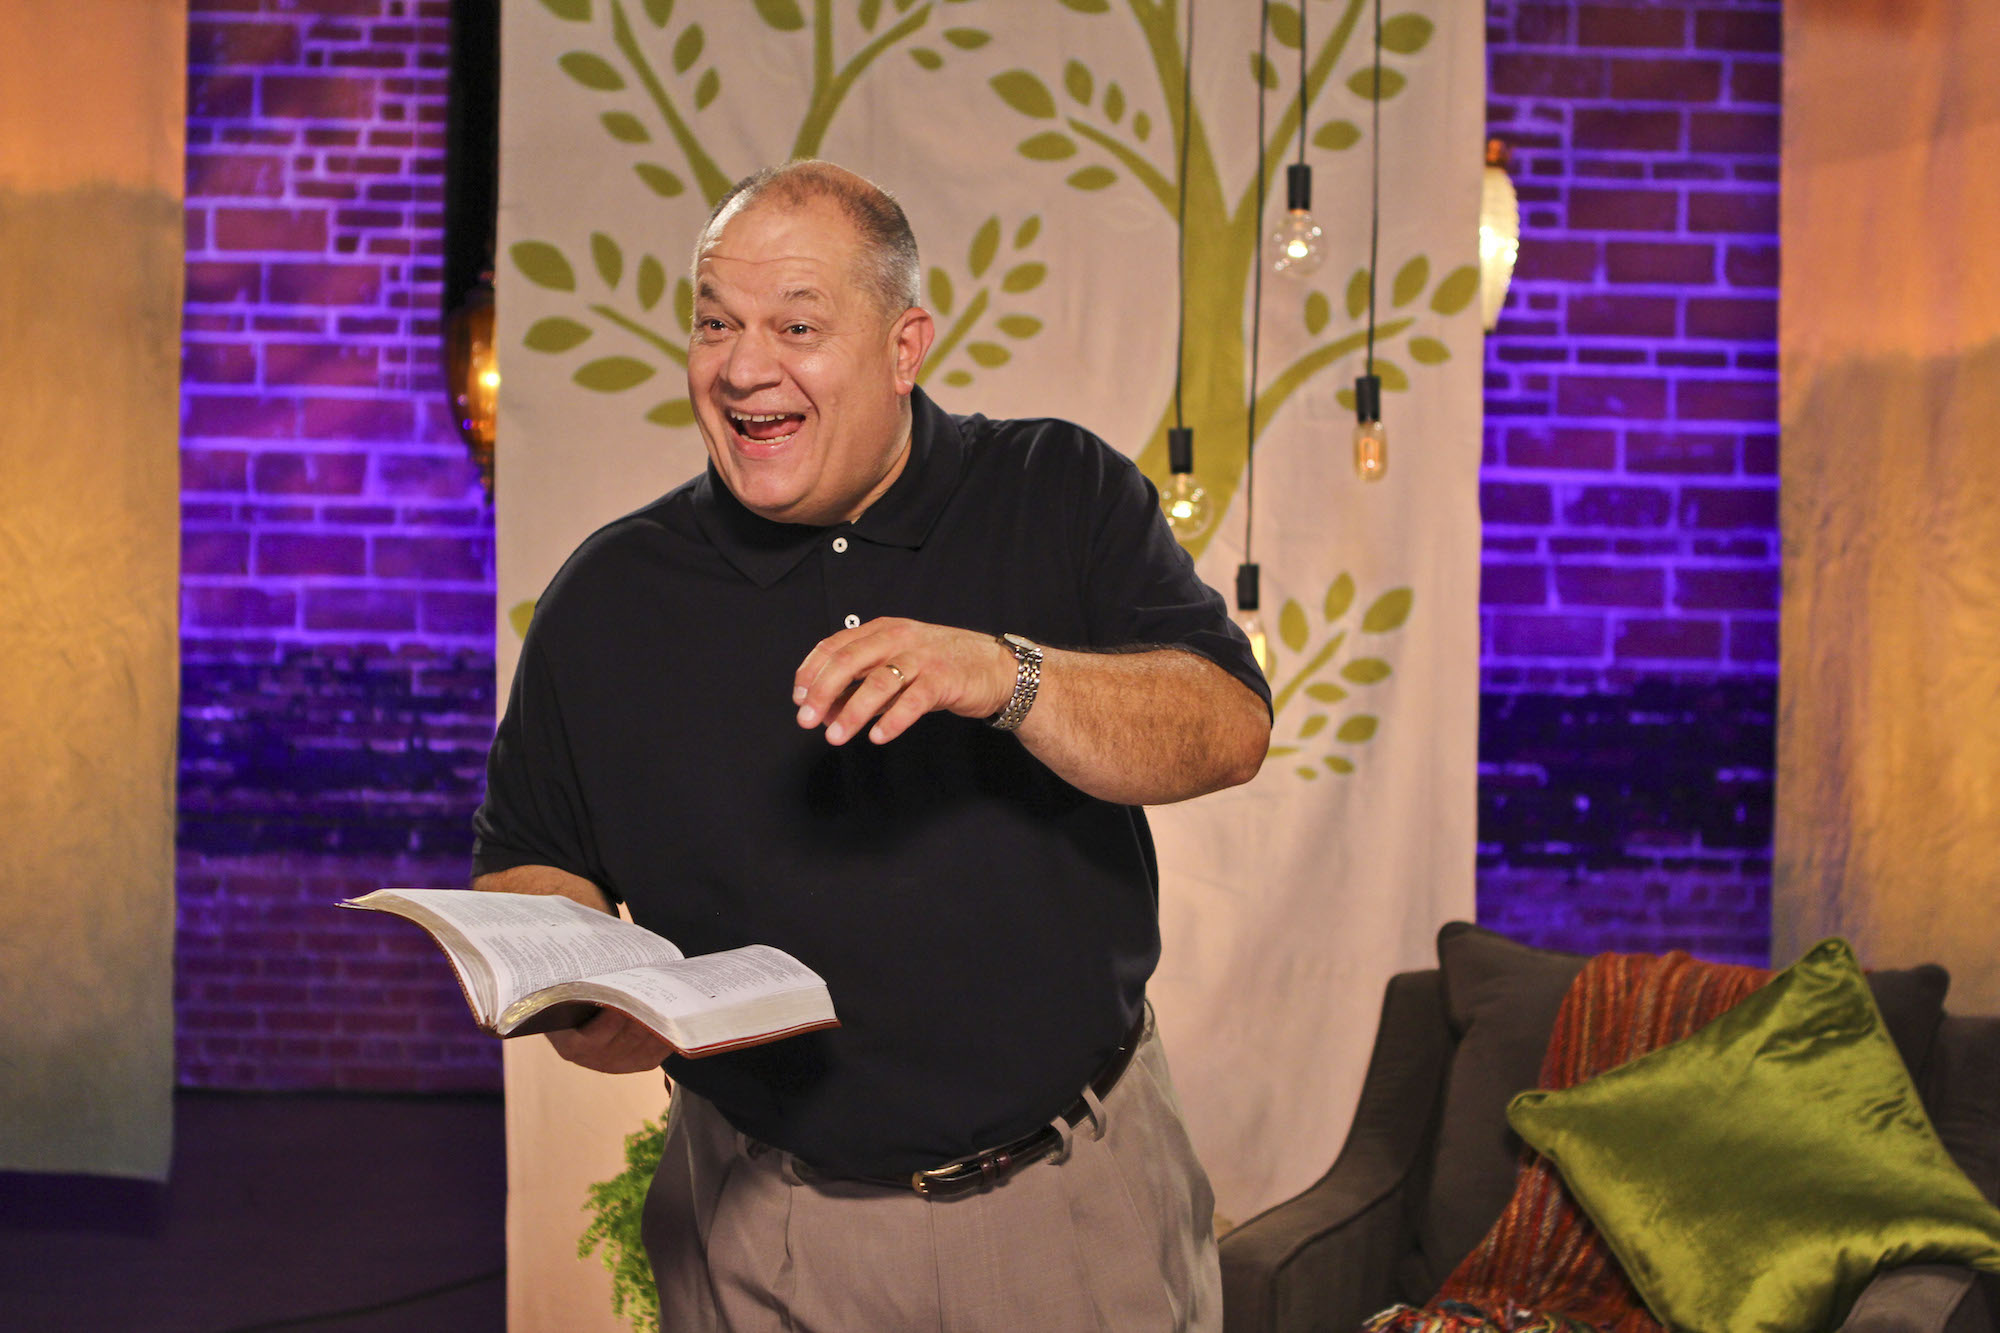 Joe_McGee Preaching Promo